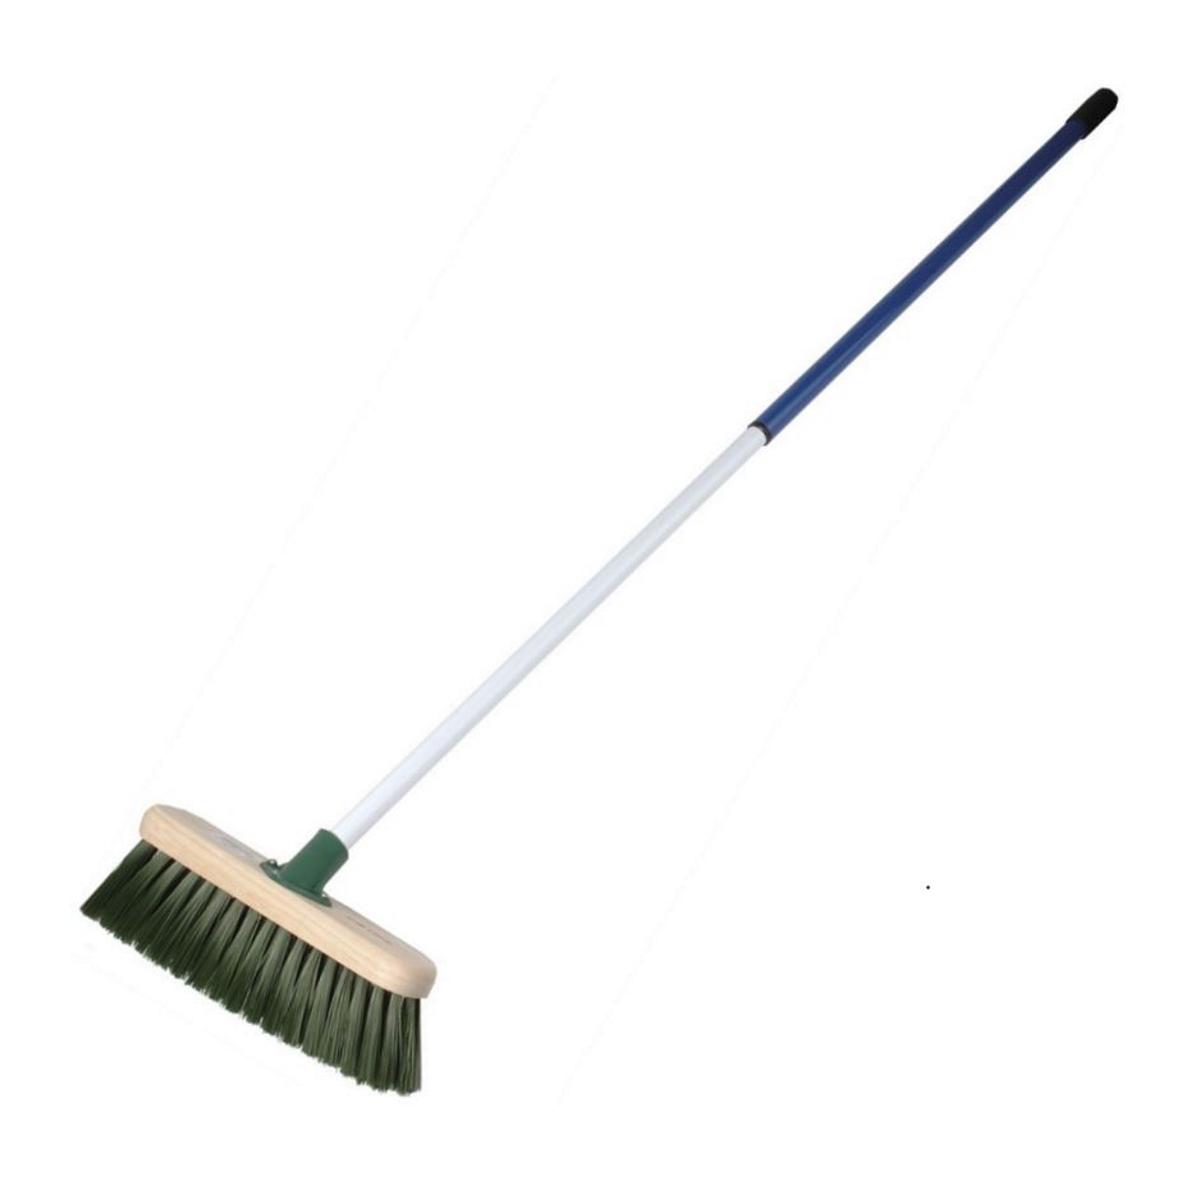 AE0220 Telescopic Broom & Handle